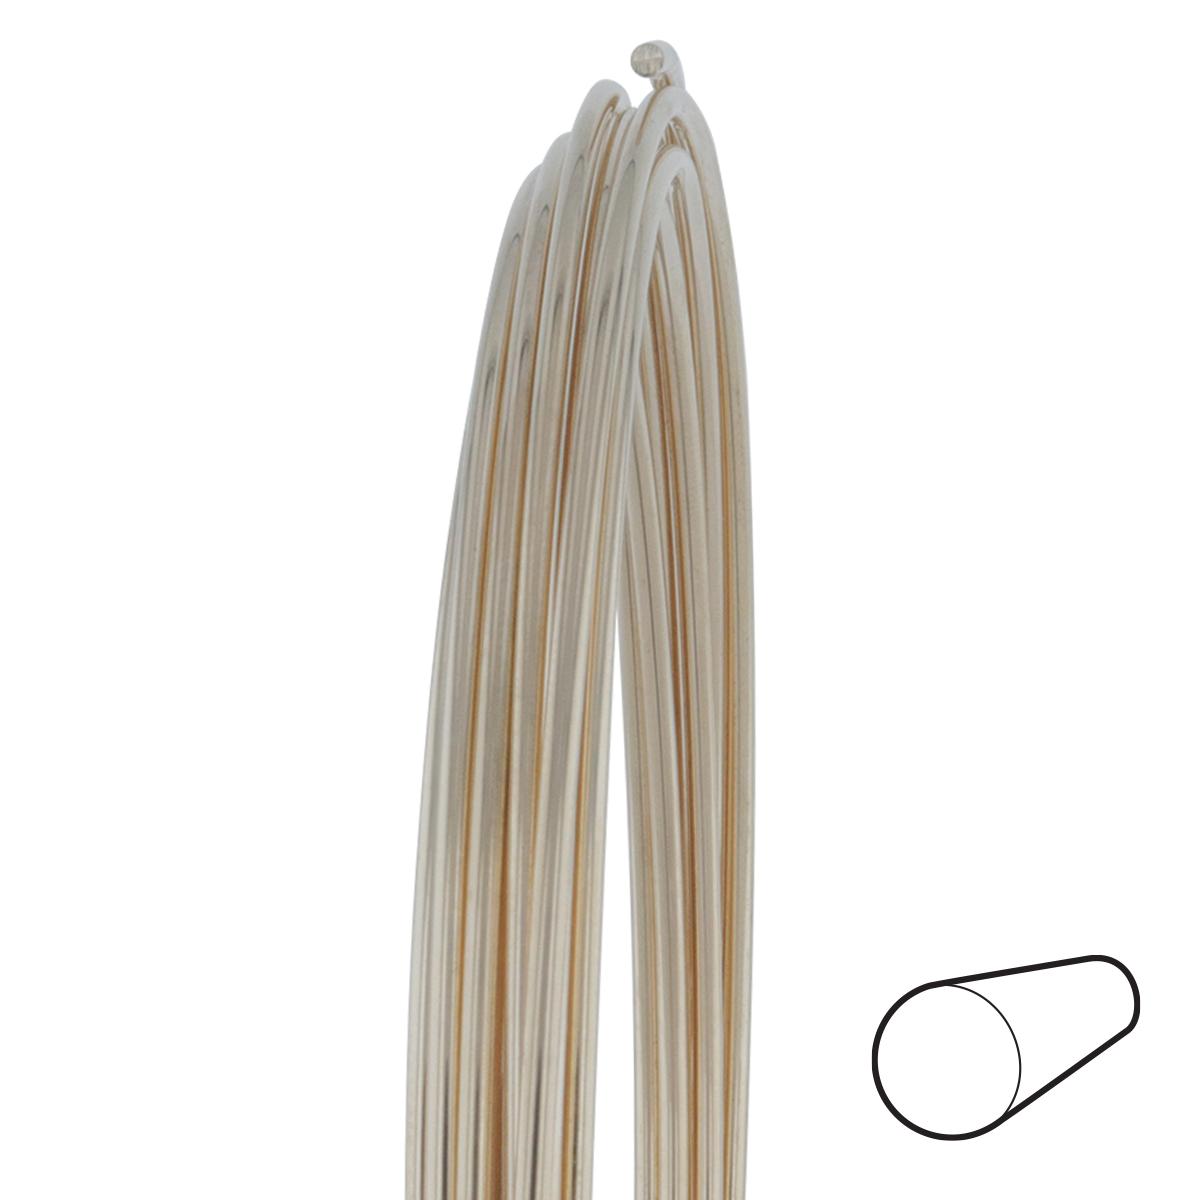 20 Gauge Round Full Hard 14/20 Gold Filled Wire: Wire Jewelry | Wire ...